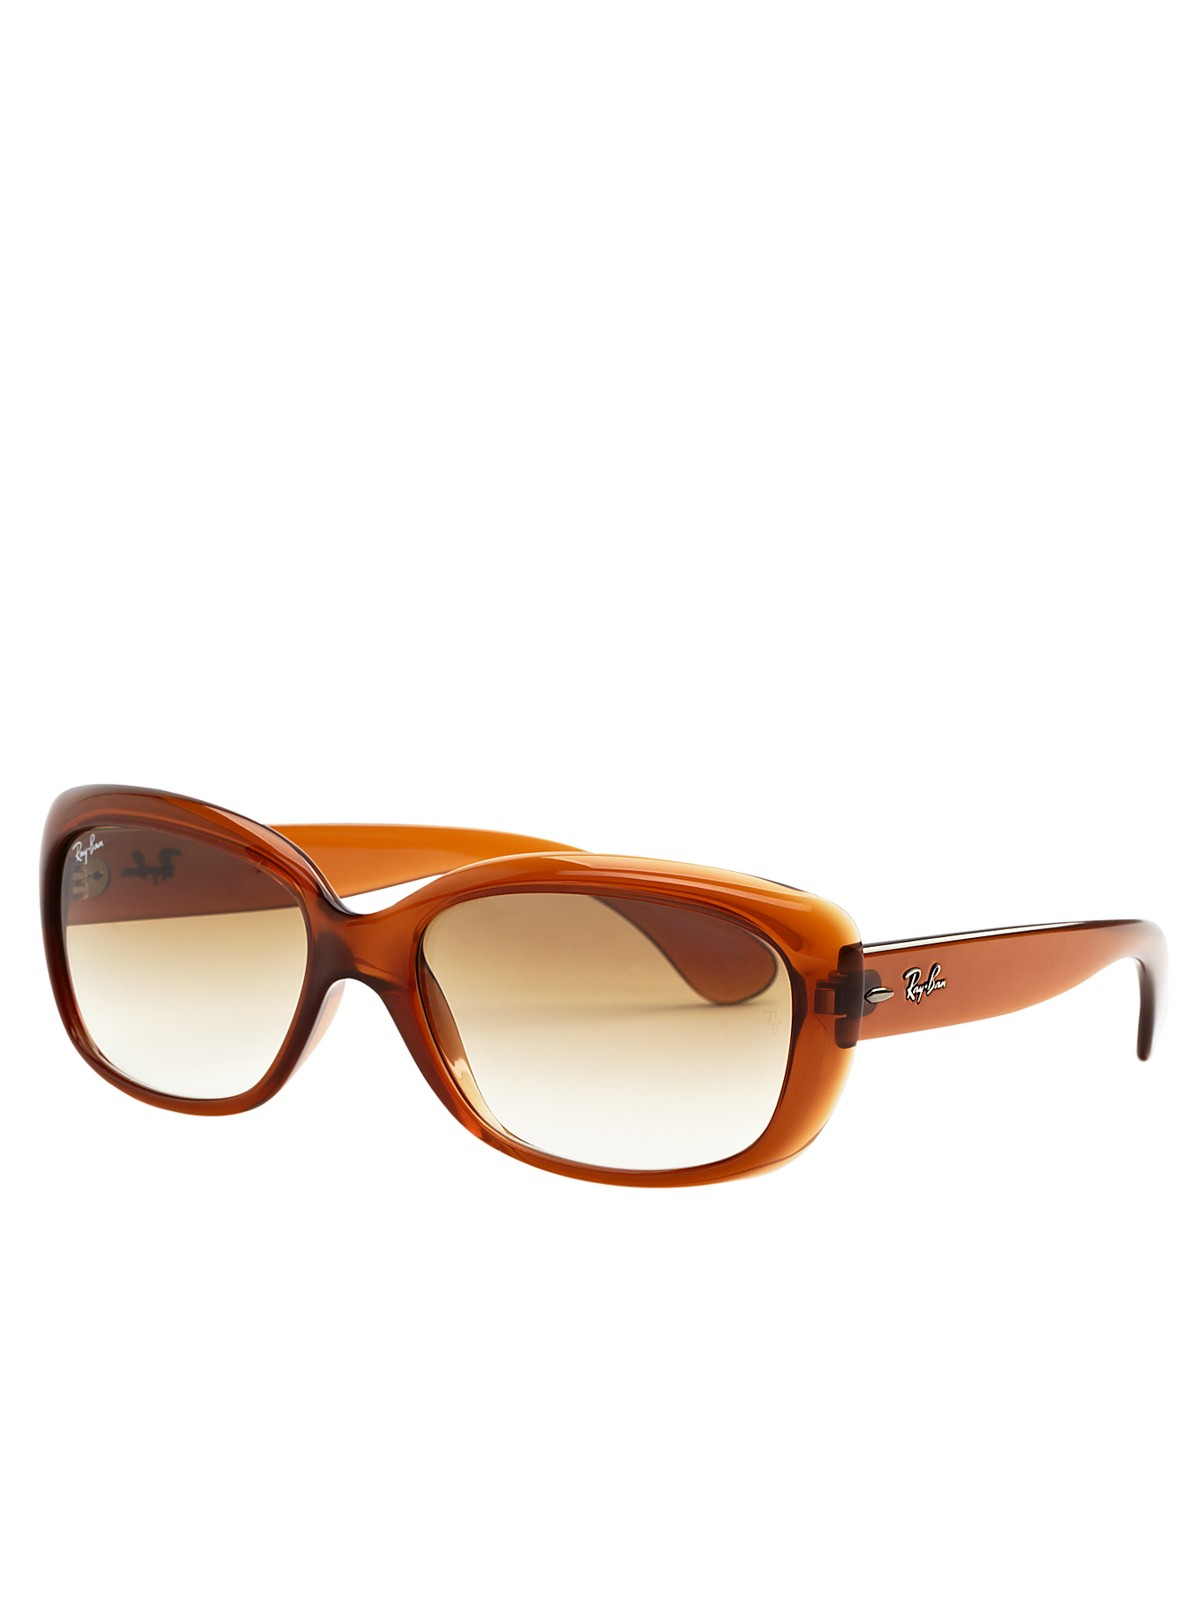 39f295b8b0bb Jackie O Sunglasses Smithsonian